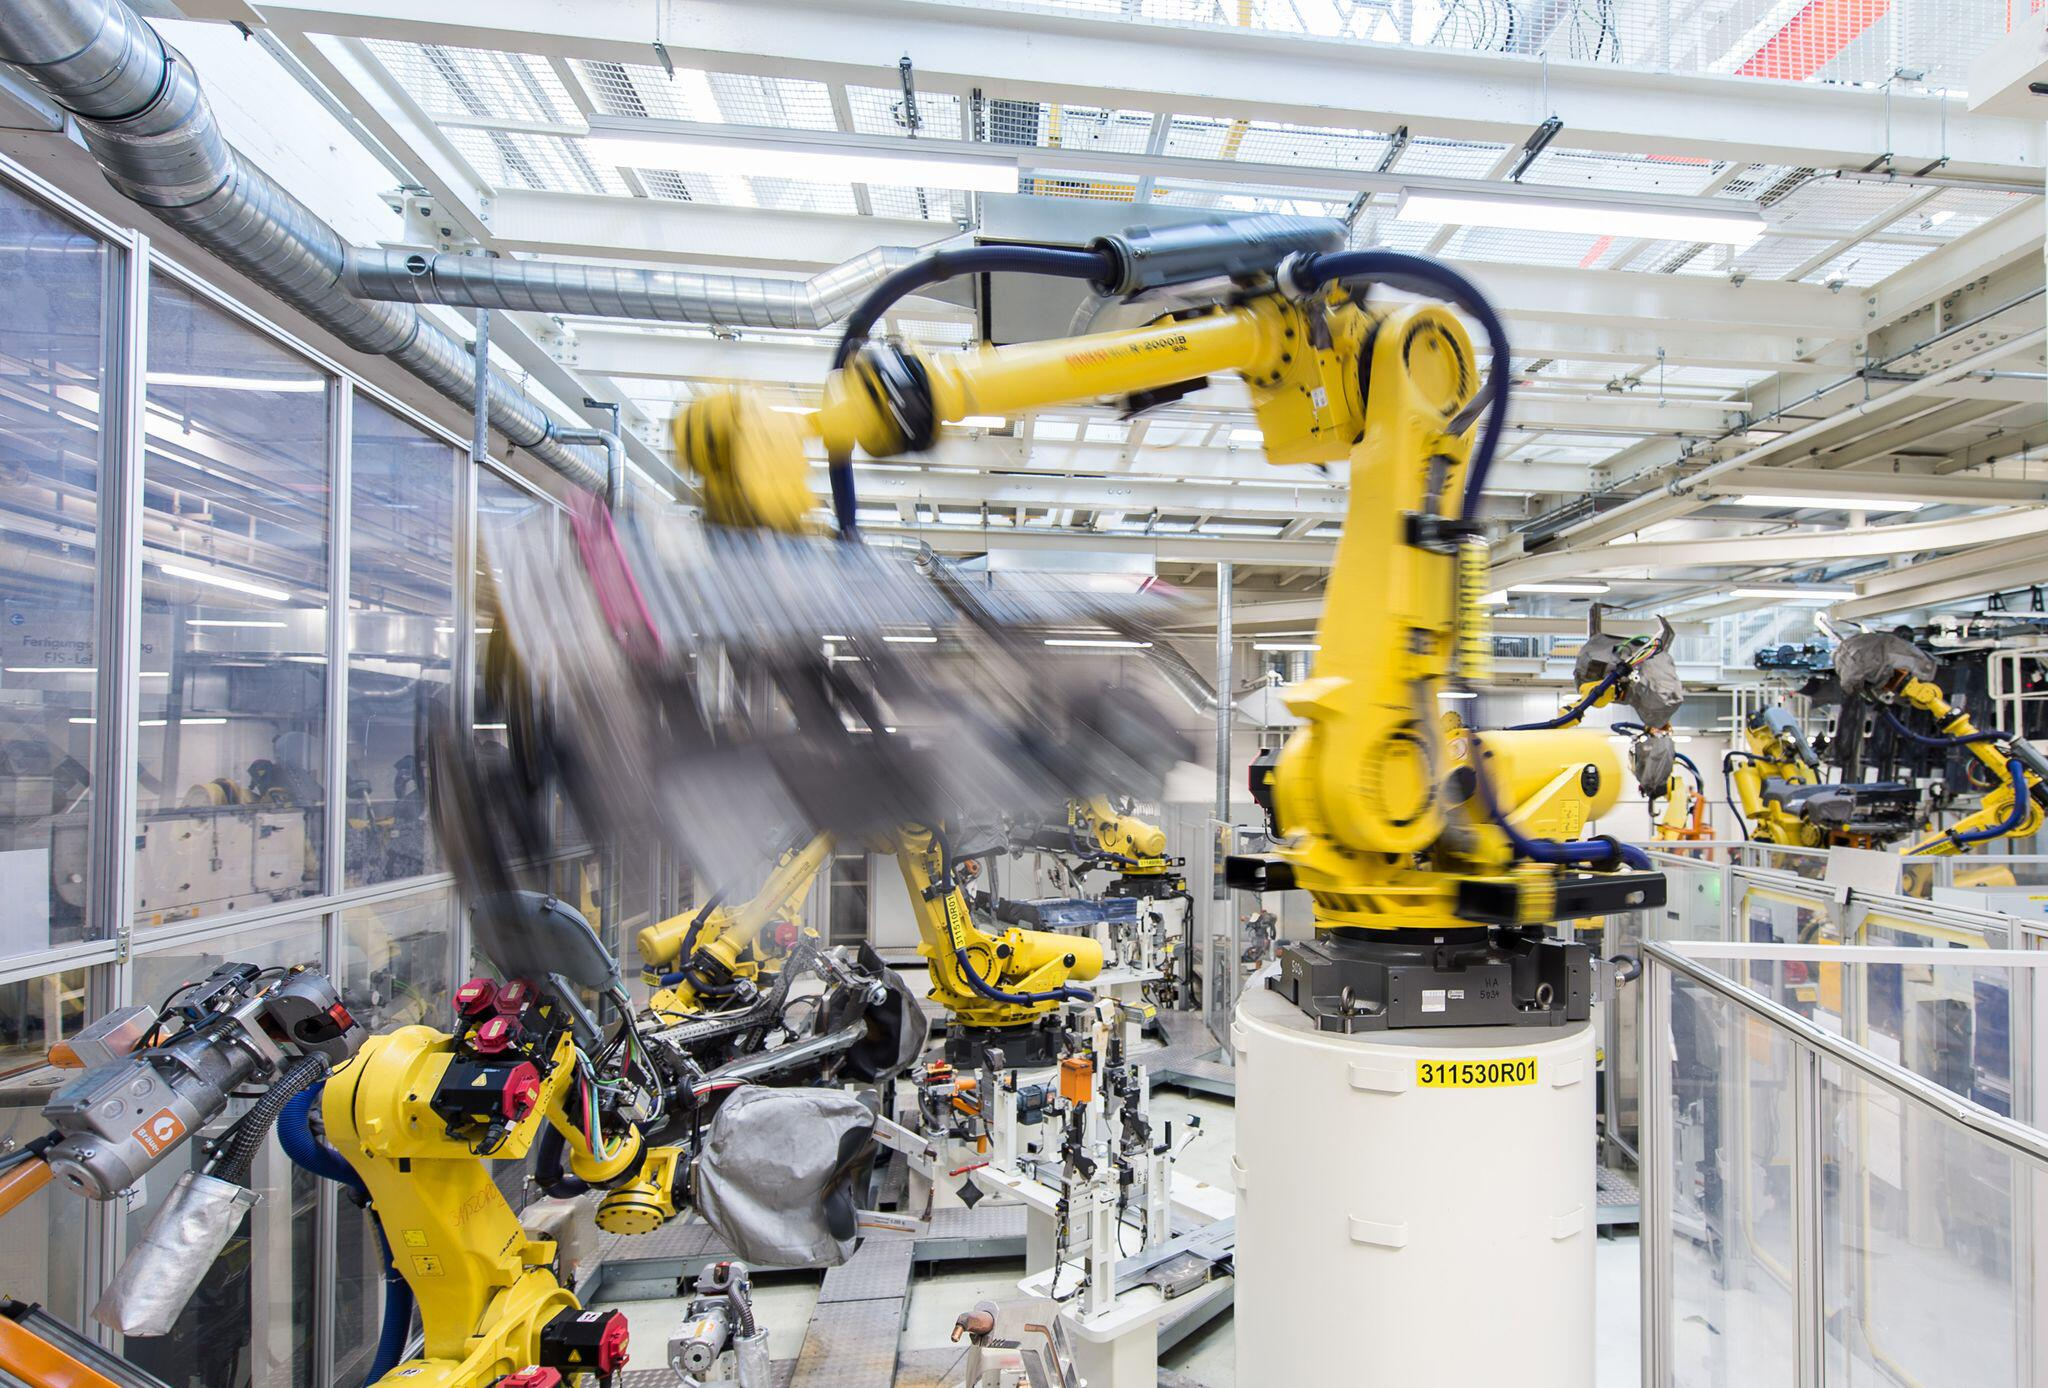 Bild zu Industrie, Roboter, Industrieroboter